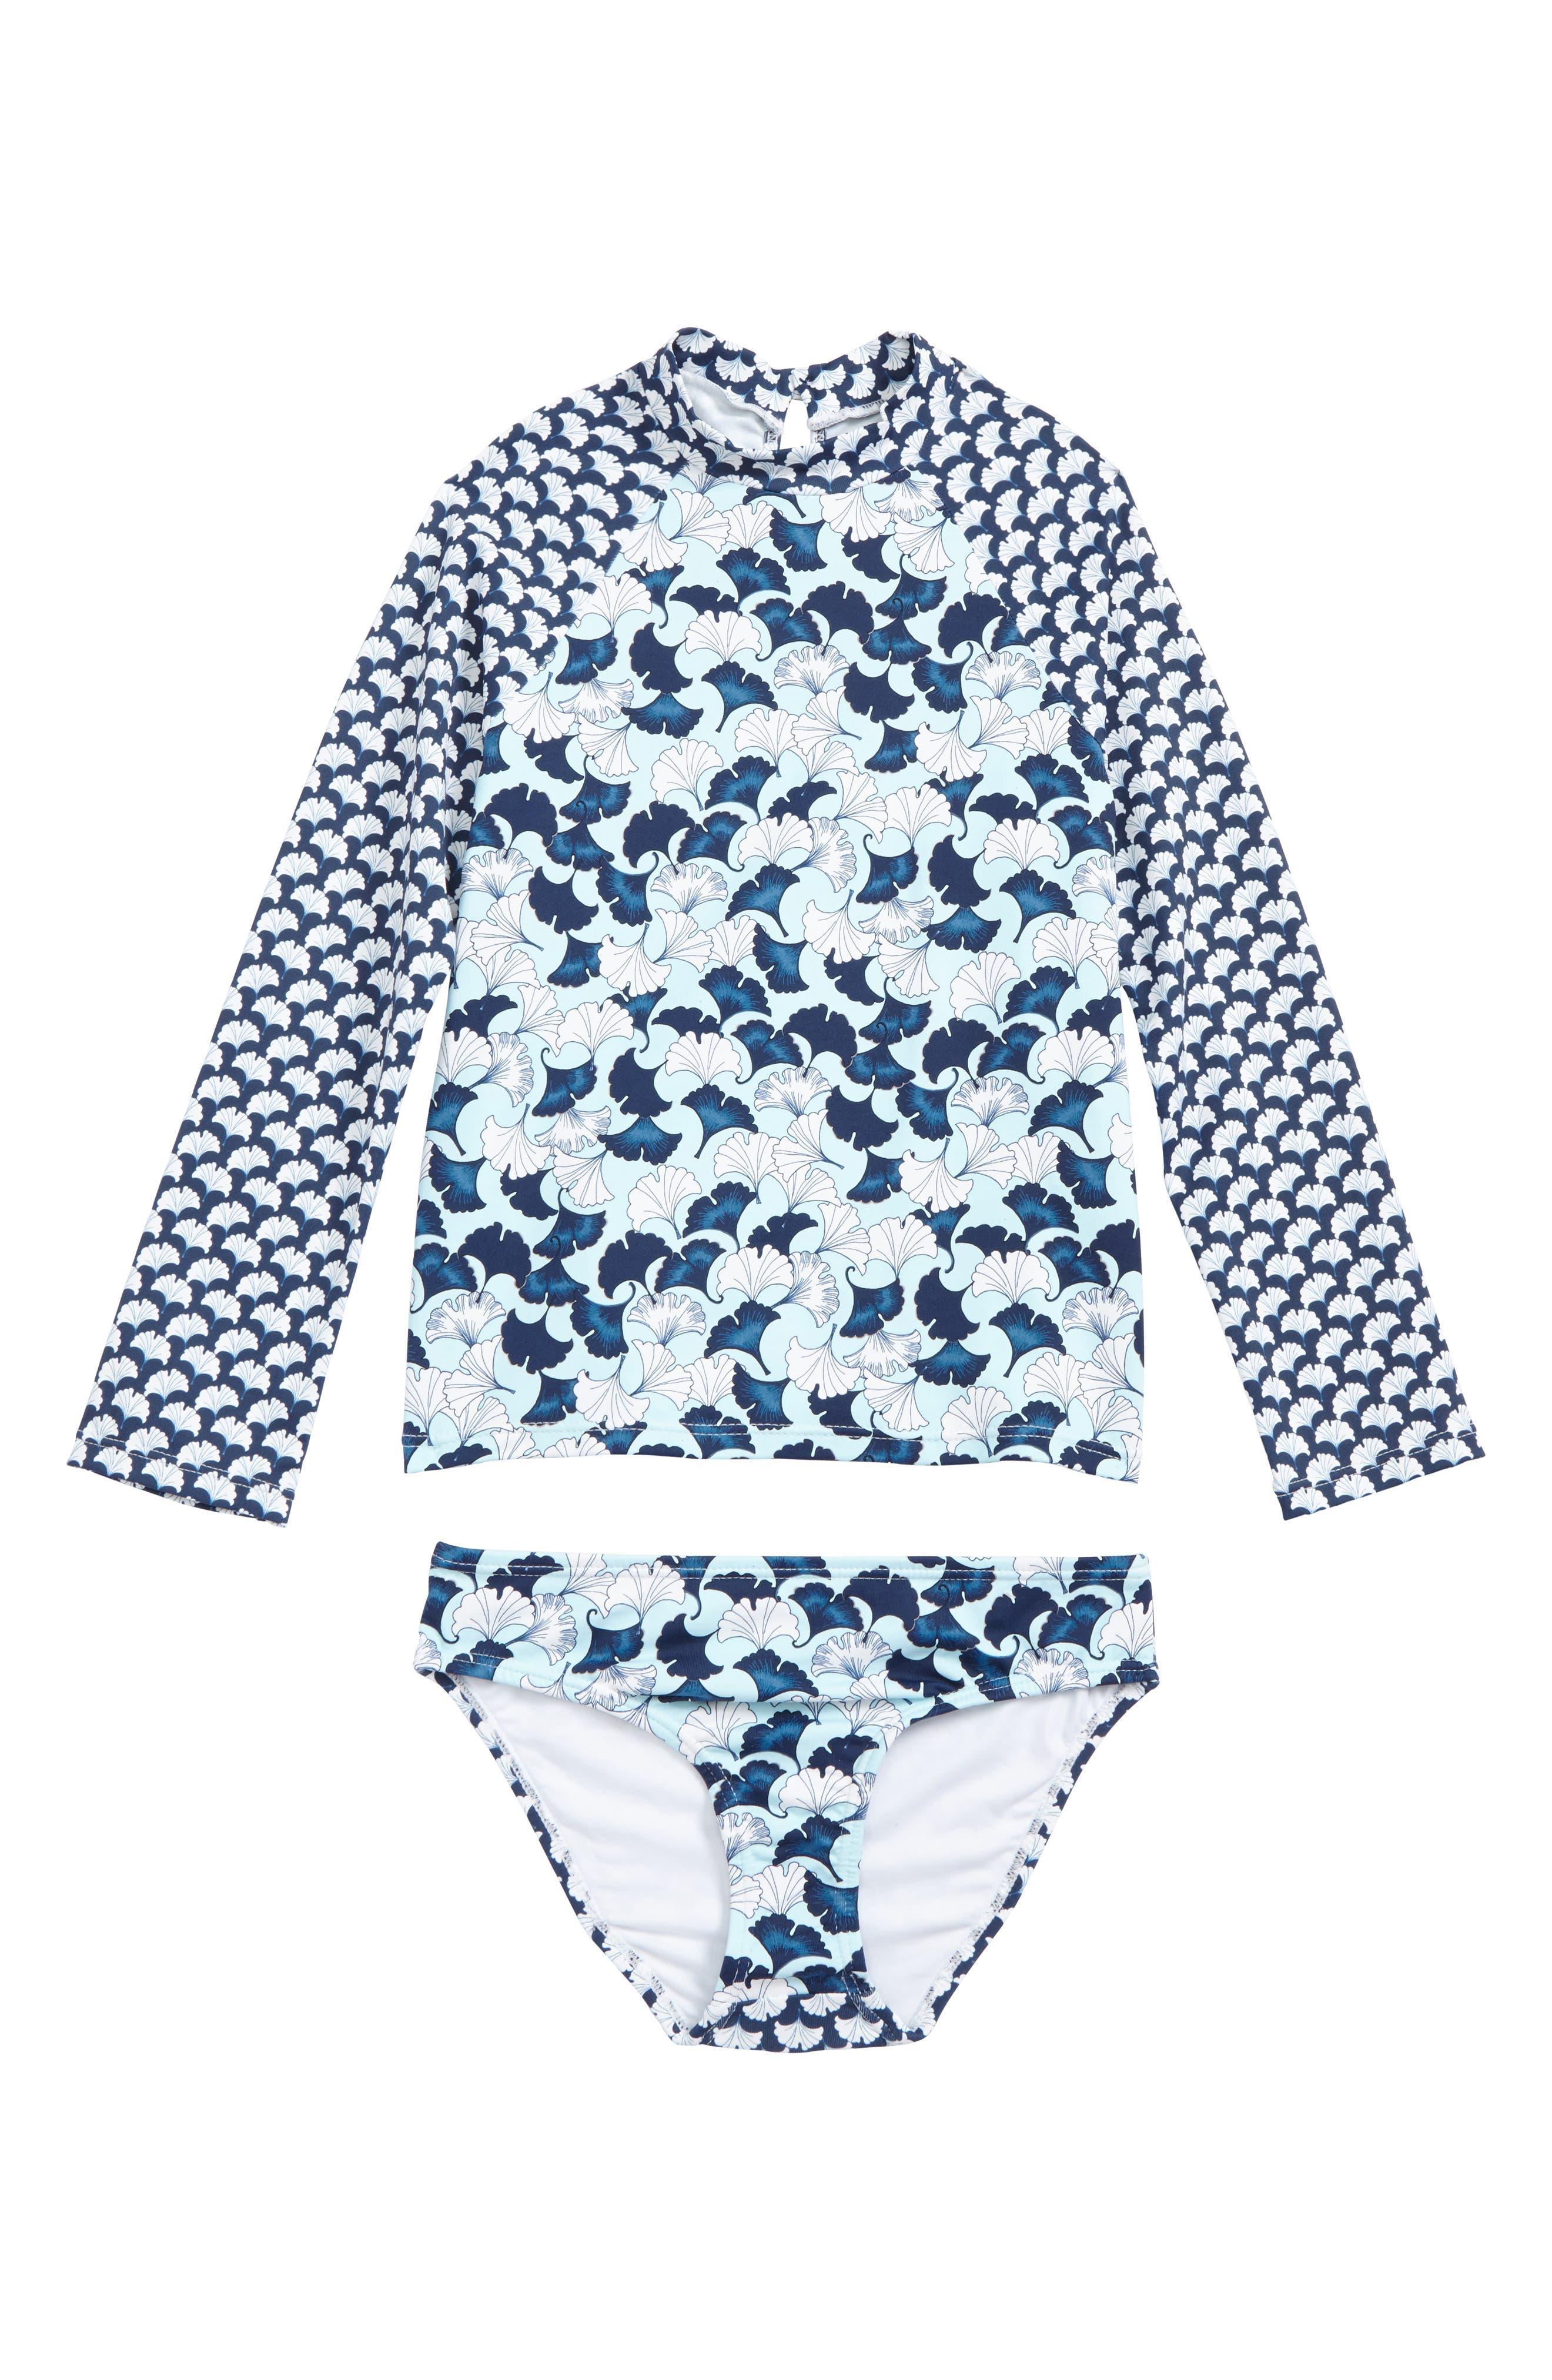 Lotto Two-Piece Rashguard Swimsuit,                             Main thumbnail 1, color,                             400